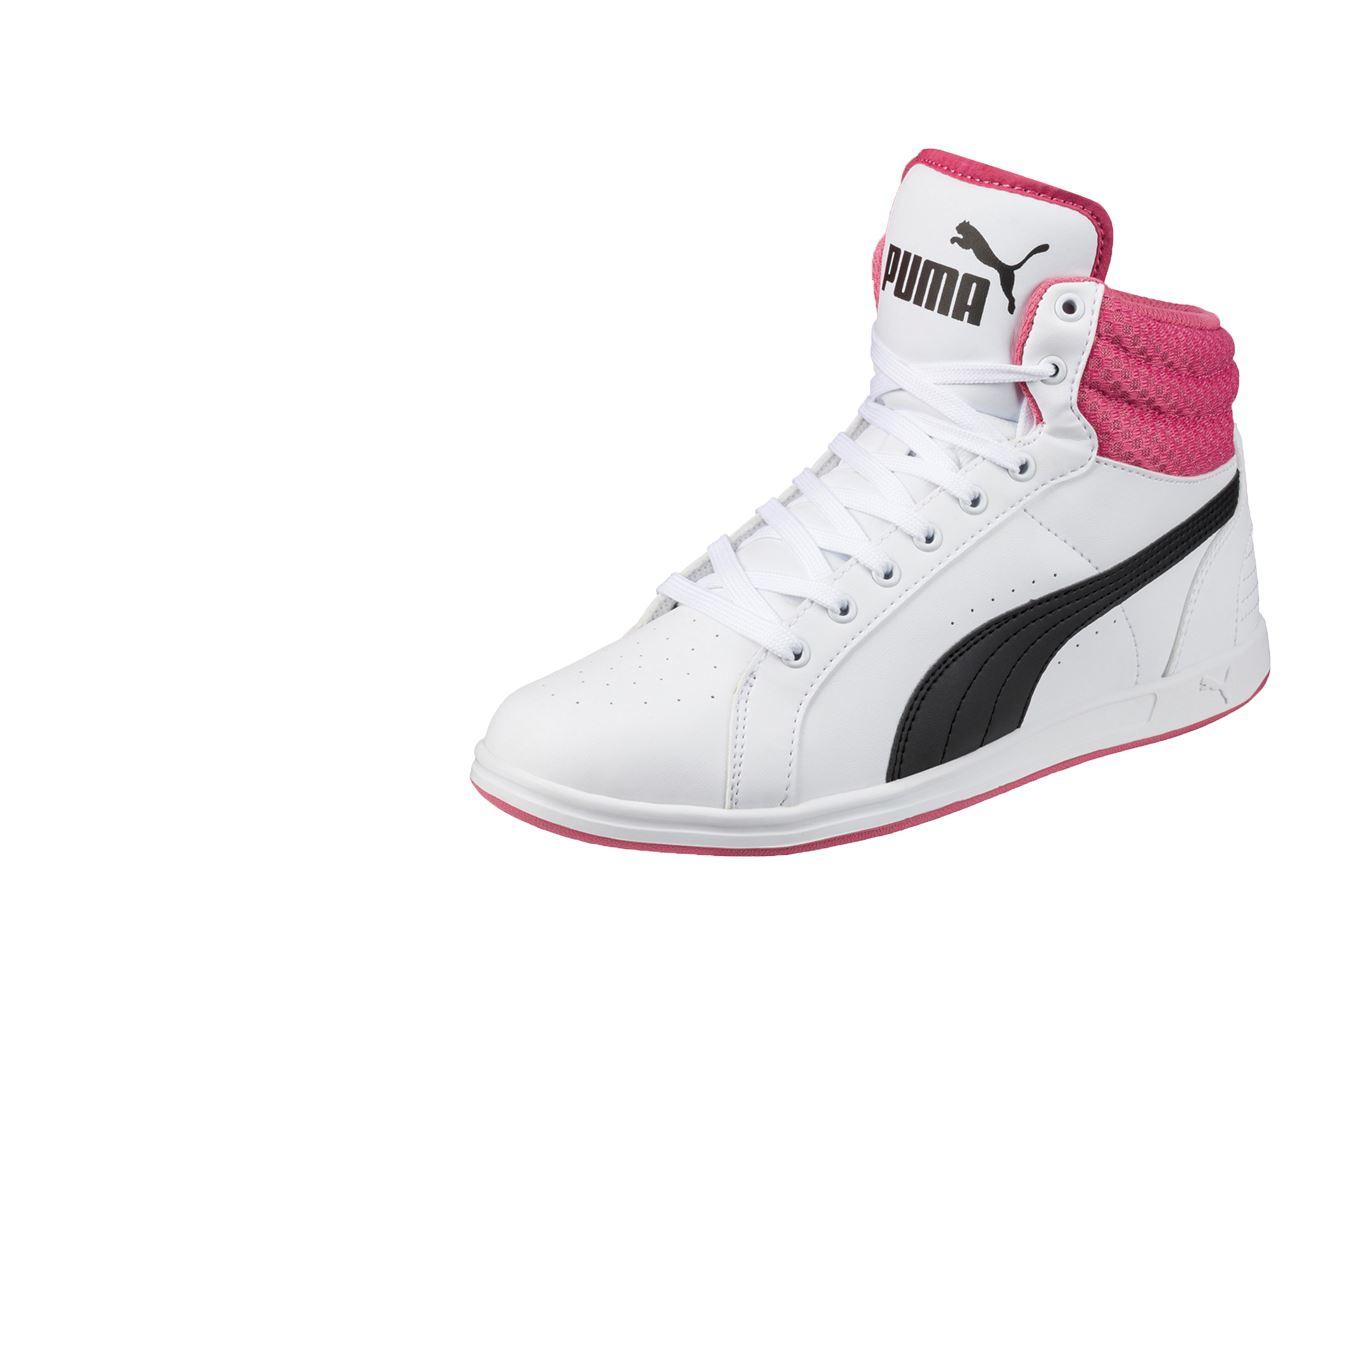 82310c44d99 Zapatilla Puma Para Mujer Urbano Blanco Rojo